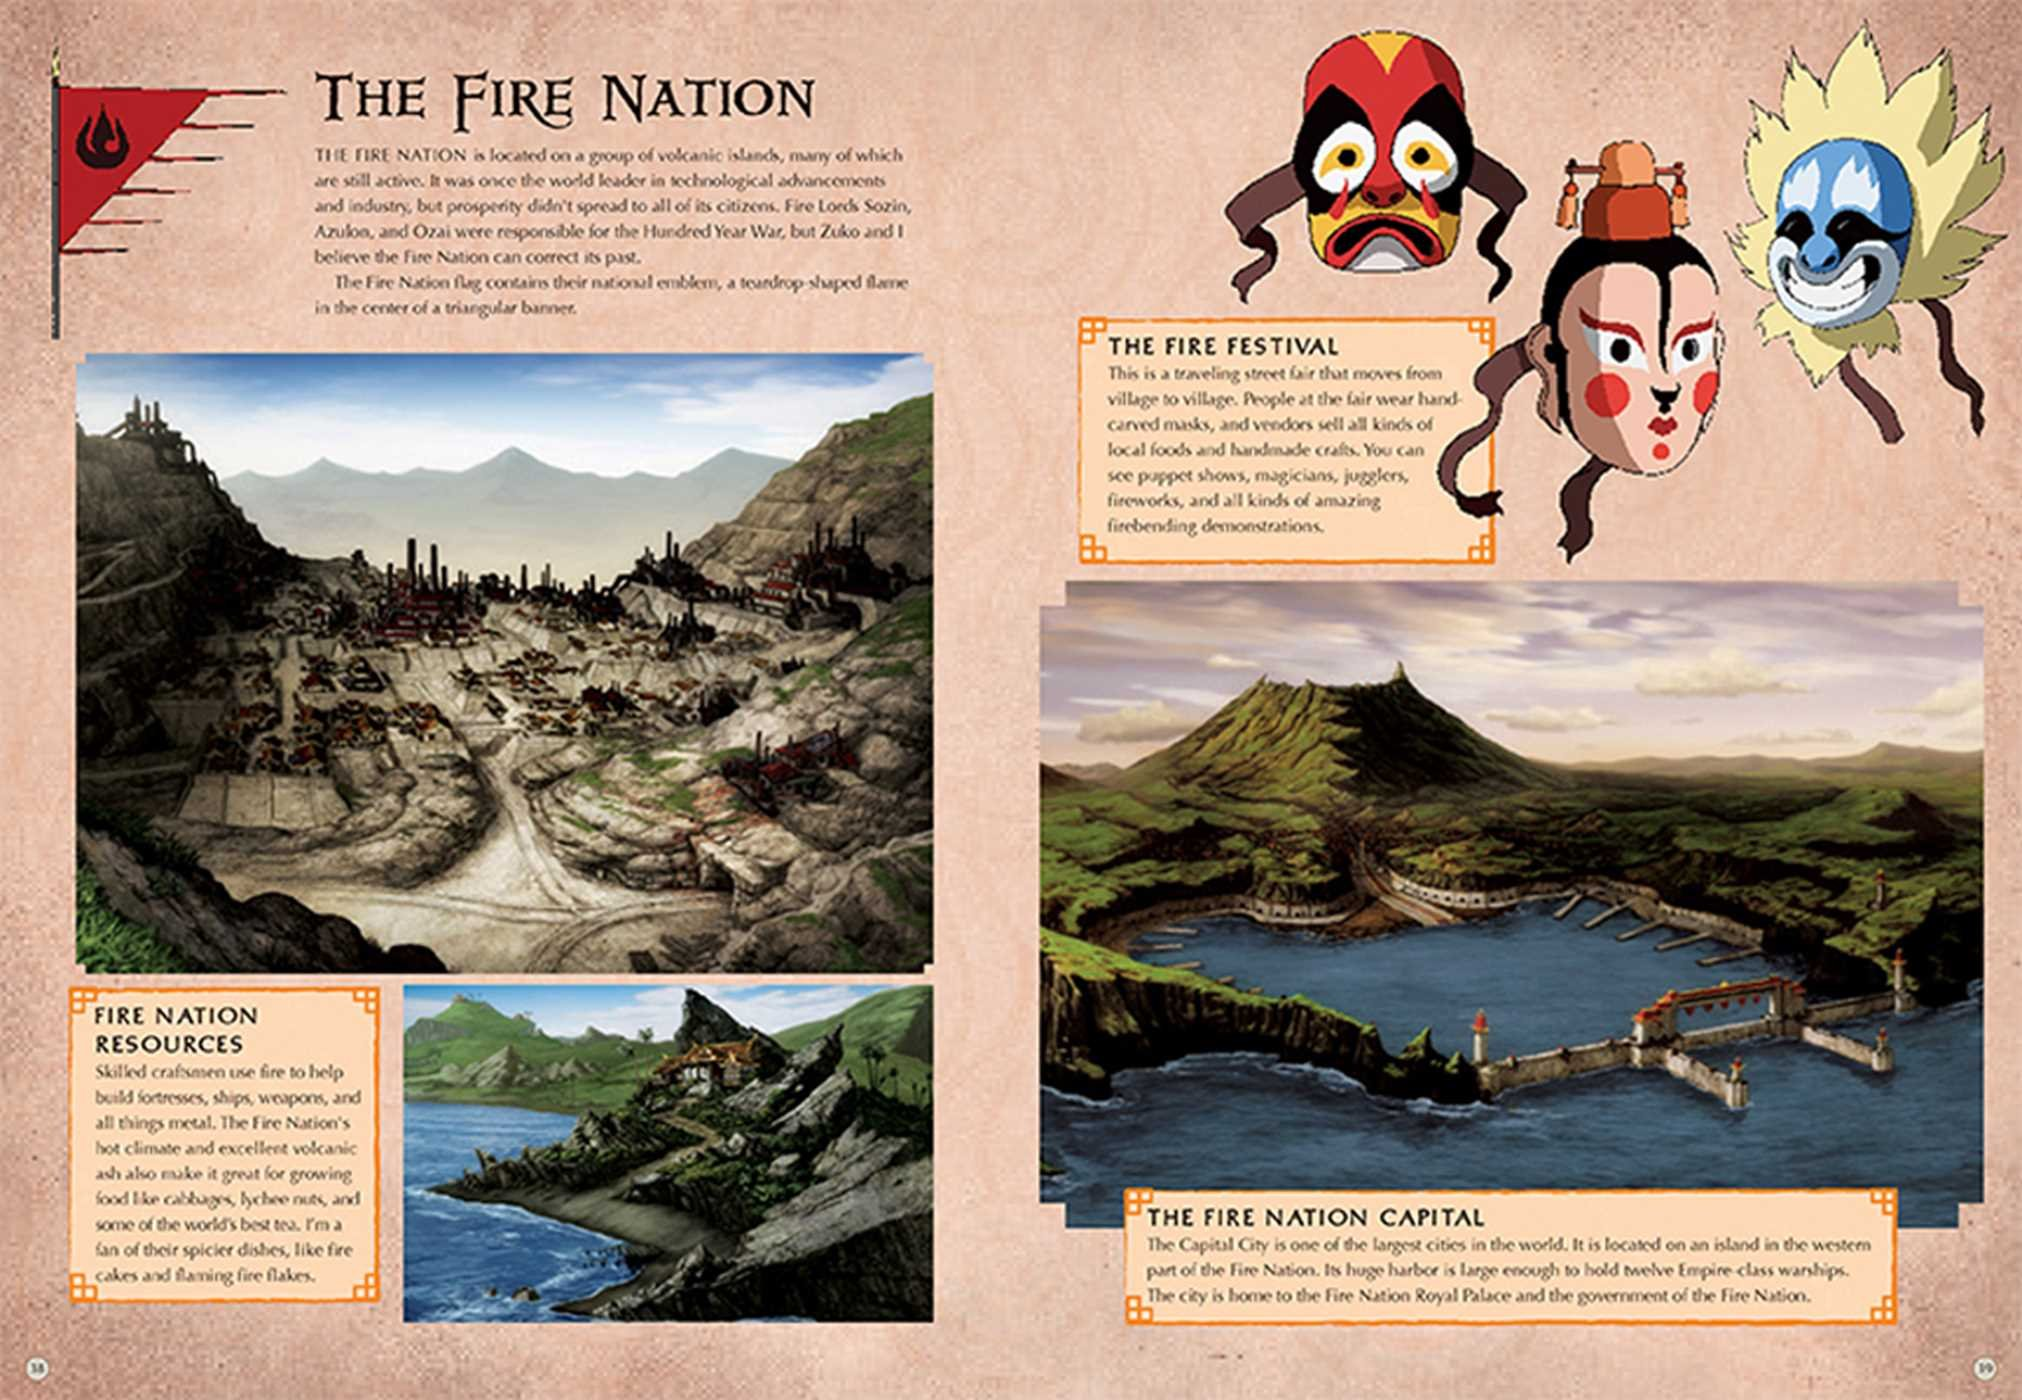 Avatar: The Last Airbender: Legacy: Amazon.es: Michael Teitelbaum: Libros en idiomas extranjeros